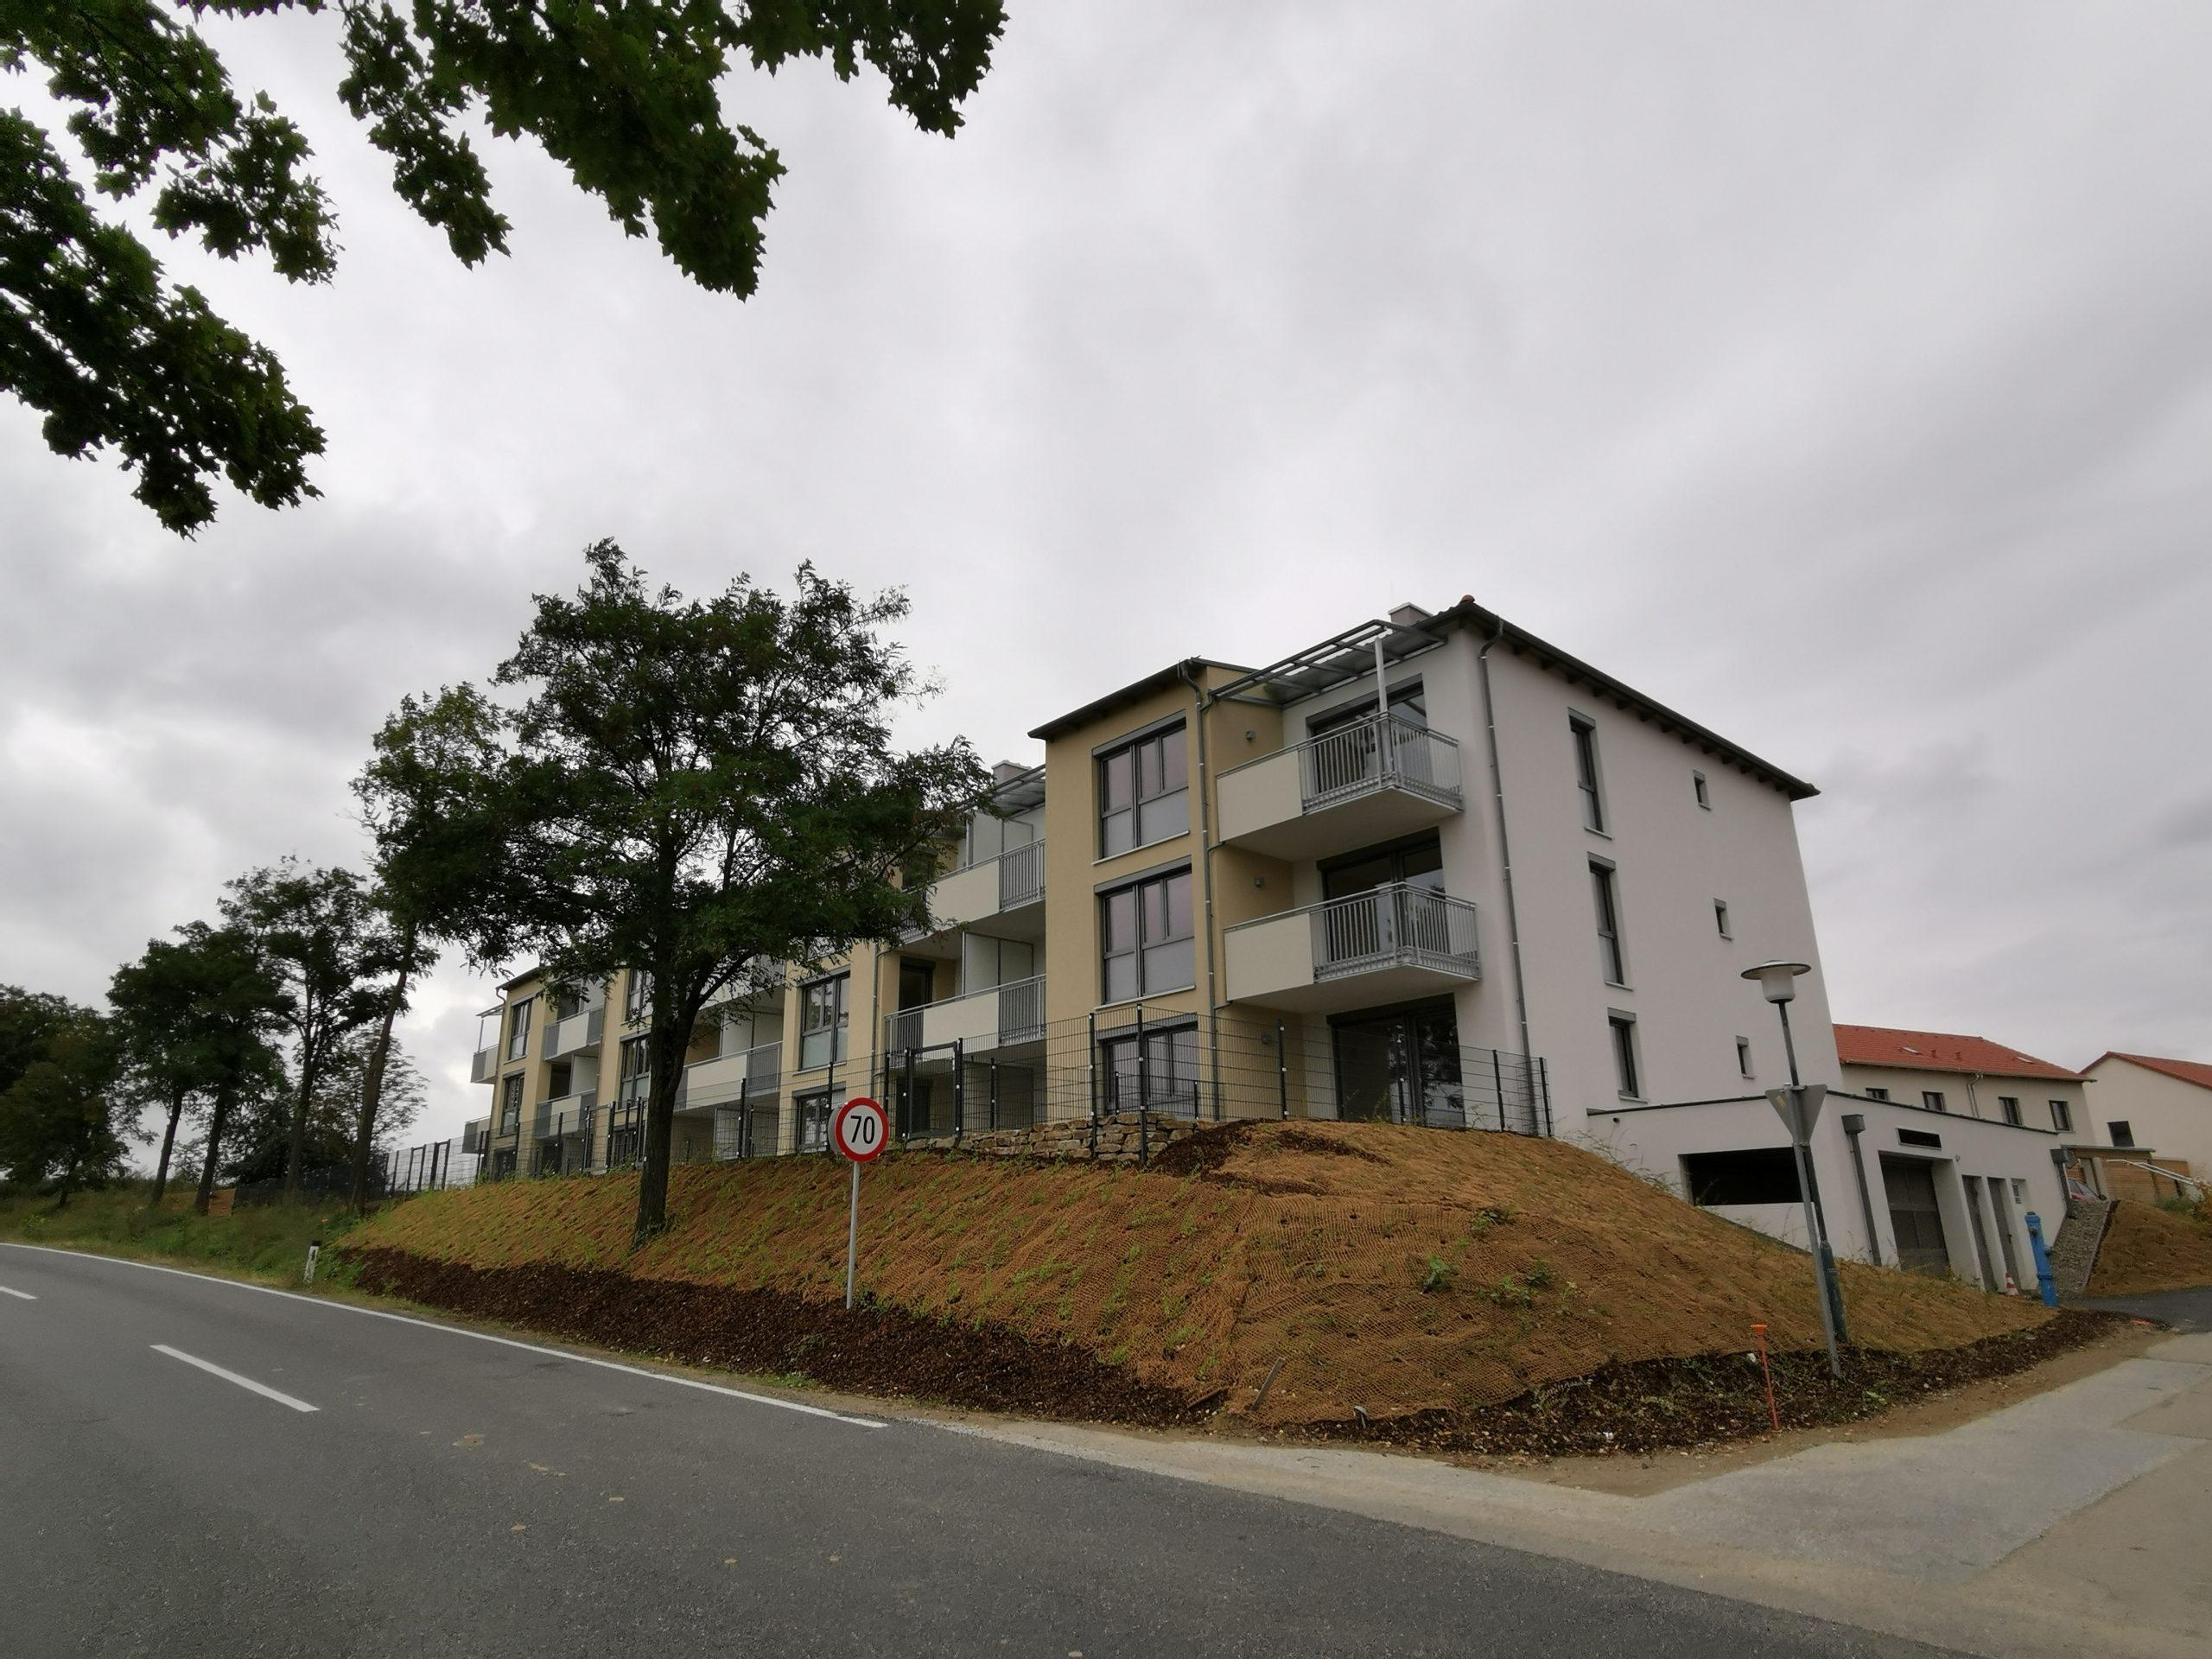 Immobilie von Kamptal in 3730 Eggenburg, Horn, Eggenburg VII - Top 106 #11